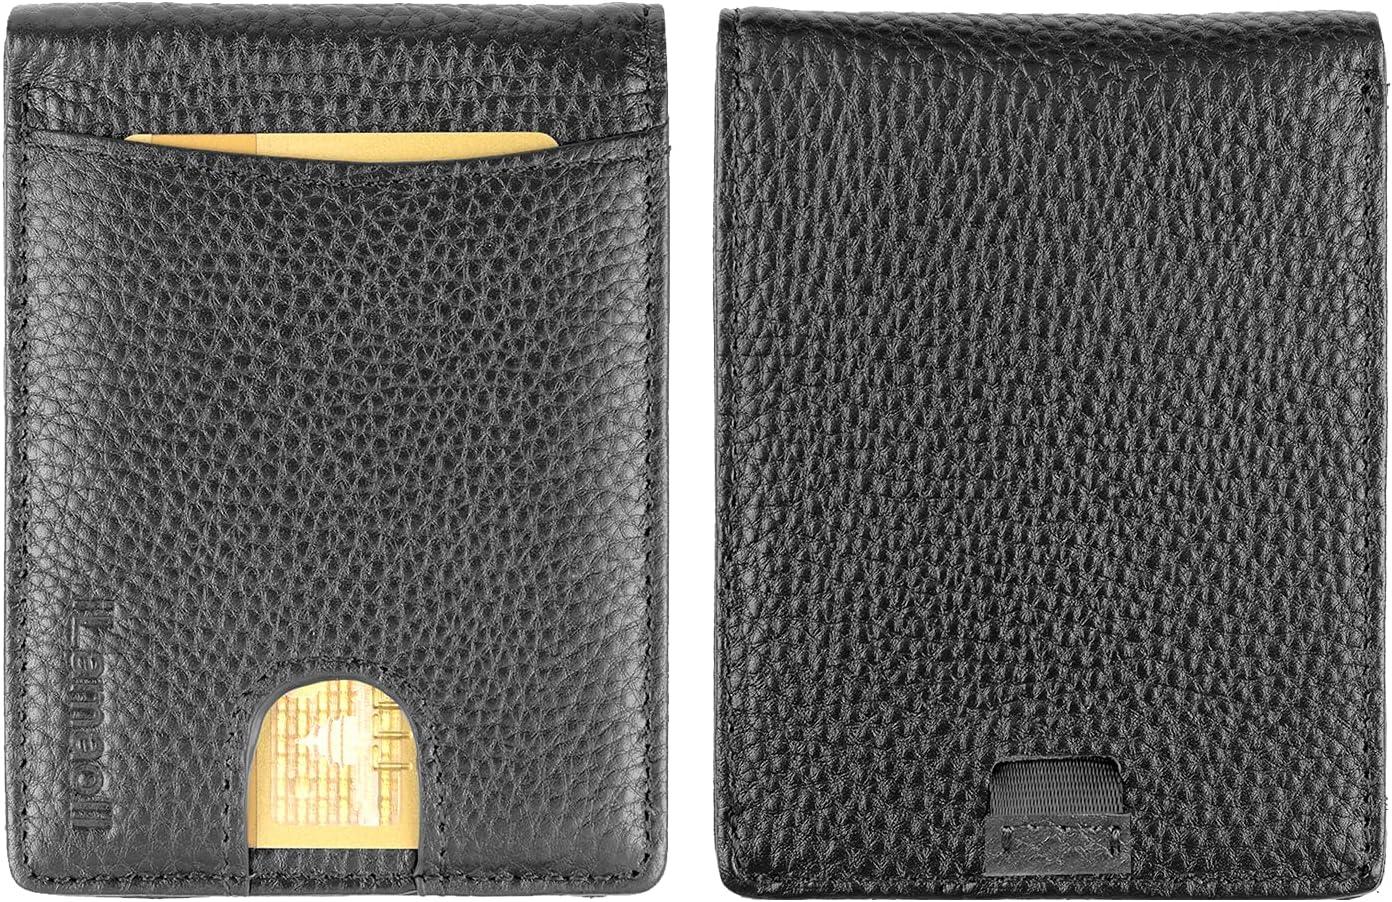 Front Pocket Wallets Money Pocket Thin Wallet for Men RFID Blocking Slim Bifold Leather Credit Card Holder for Women Walette Halloween